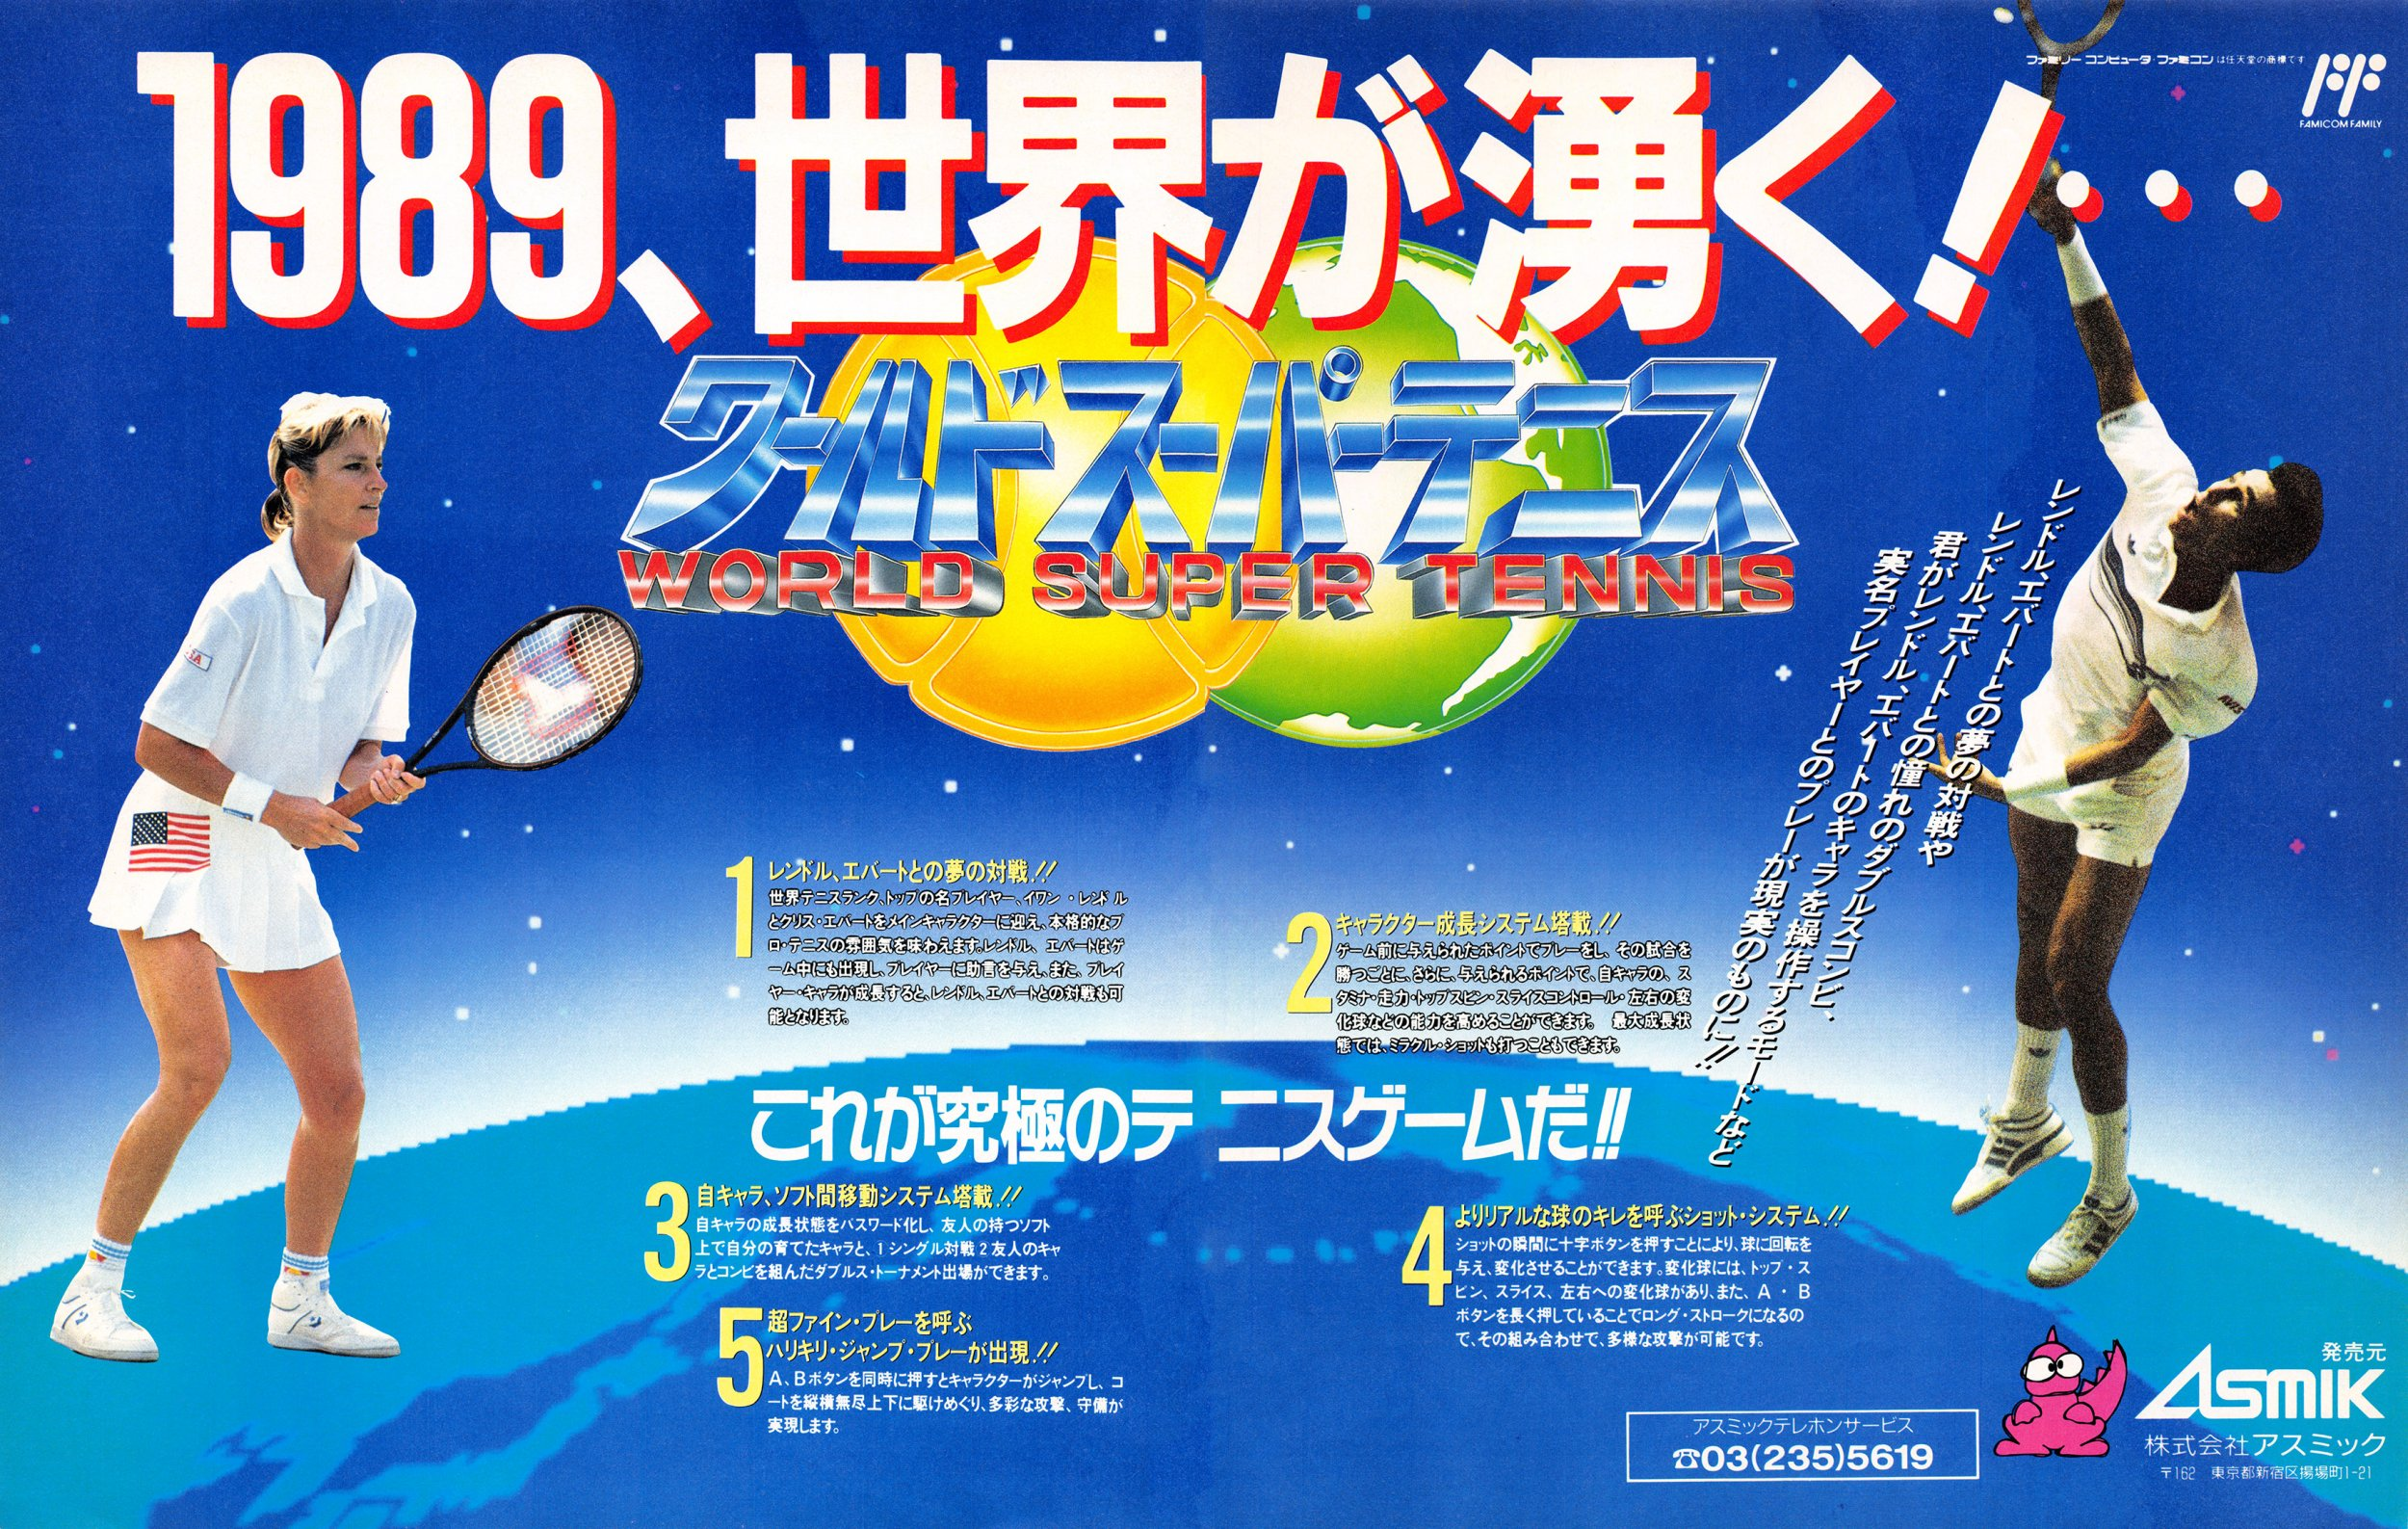 Top Players' Tennis (World Super Tennis) (Japan)